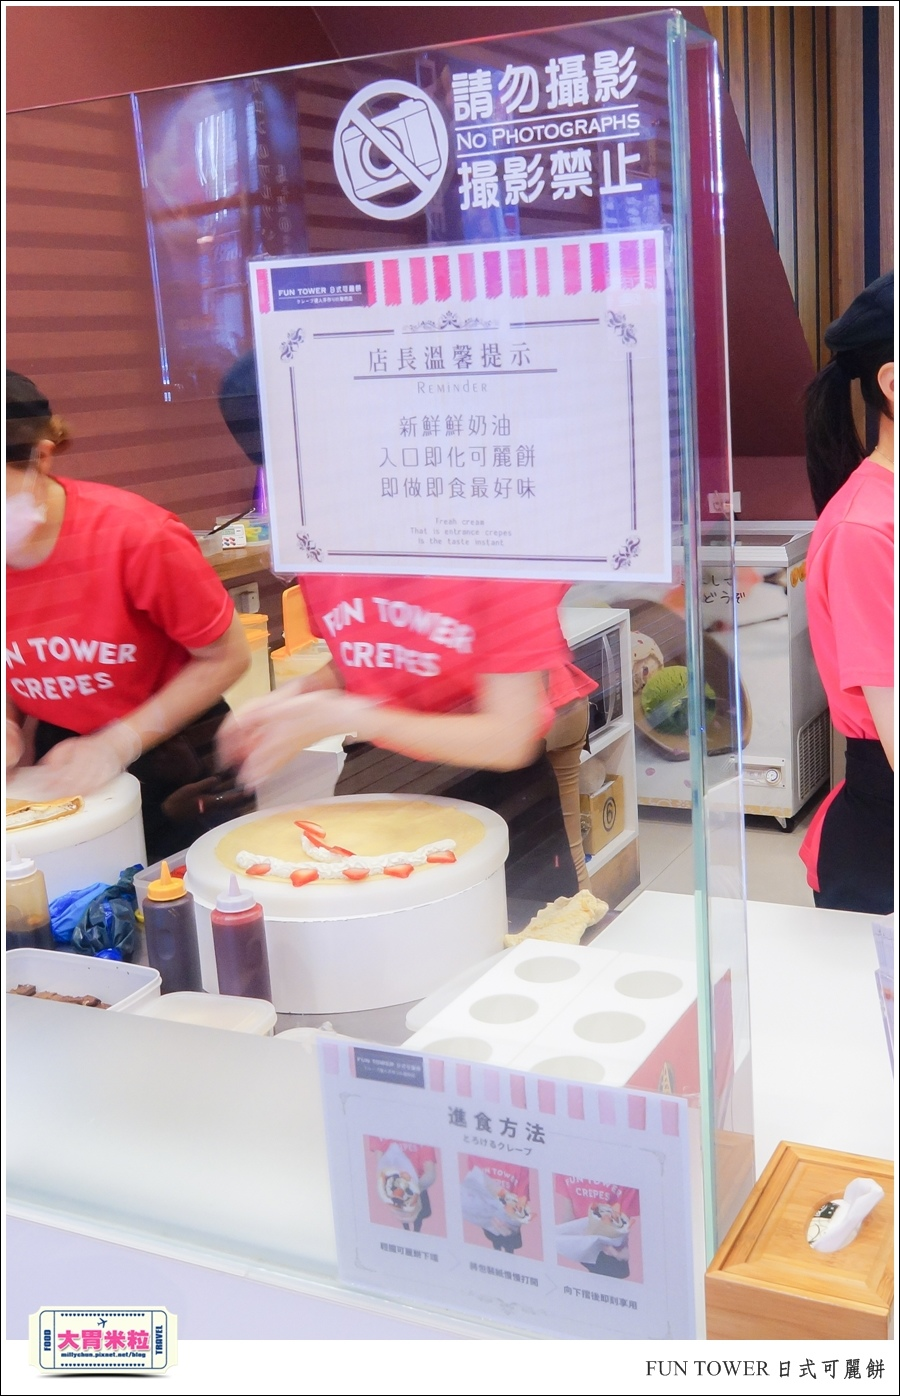 FUN TOWER日式可麗餅(高雄明華店)@高雄可麗餅甜點推薦@大胃米粒0053.jpg